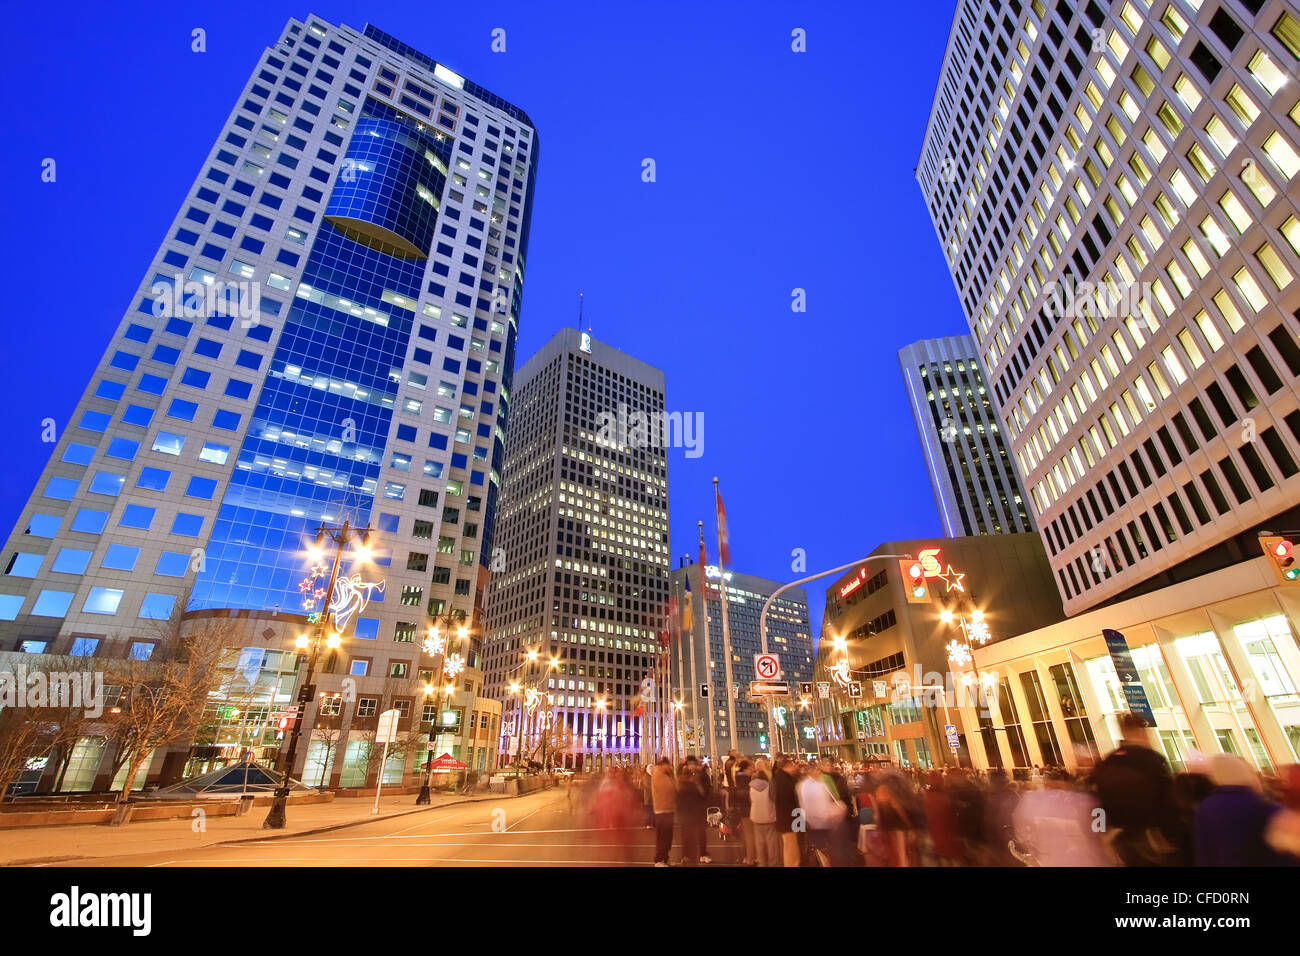 Skyline and crowd gathered on Portage Avenue at night. Winnipeg, Manitoba, Canada. - Stock Image